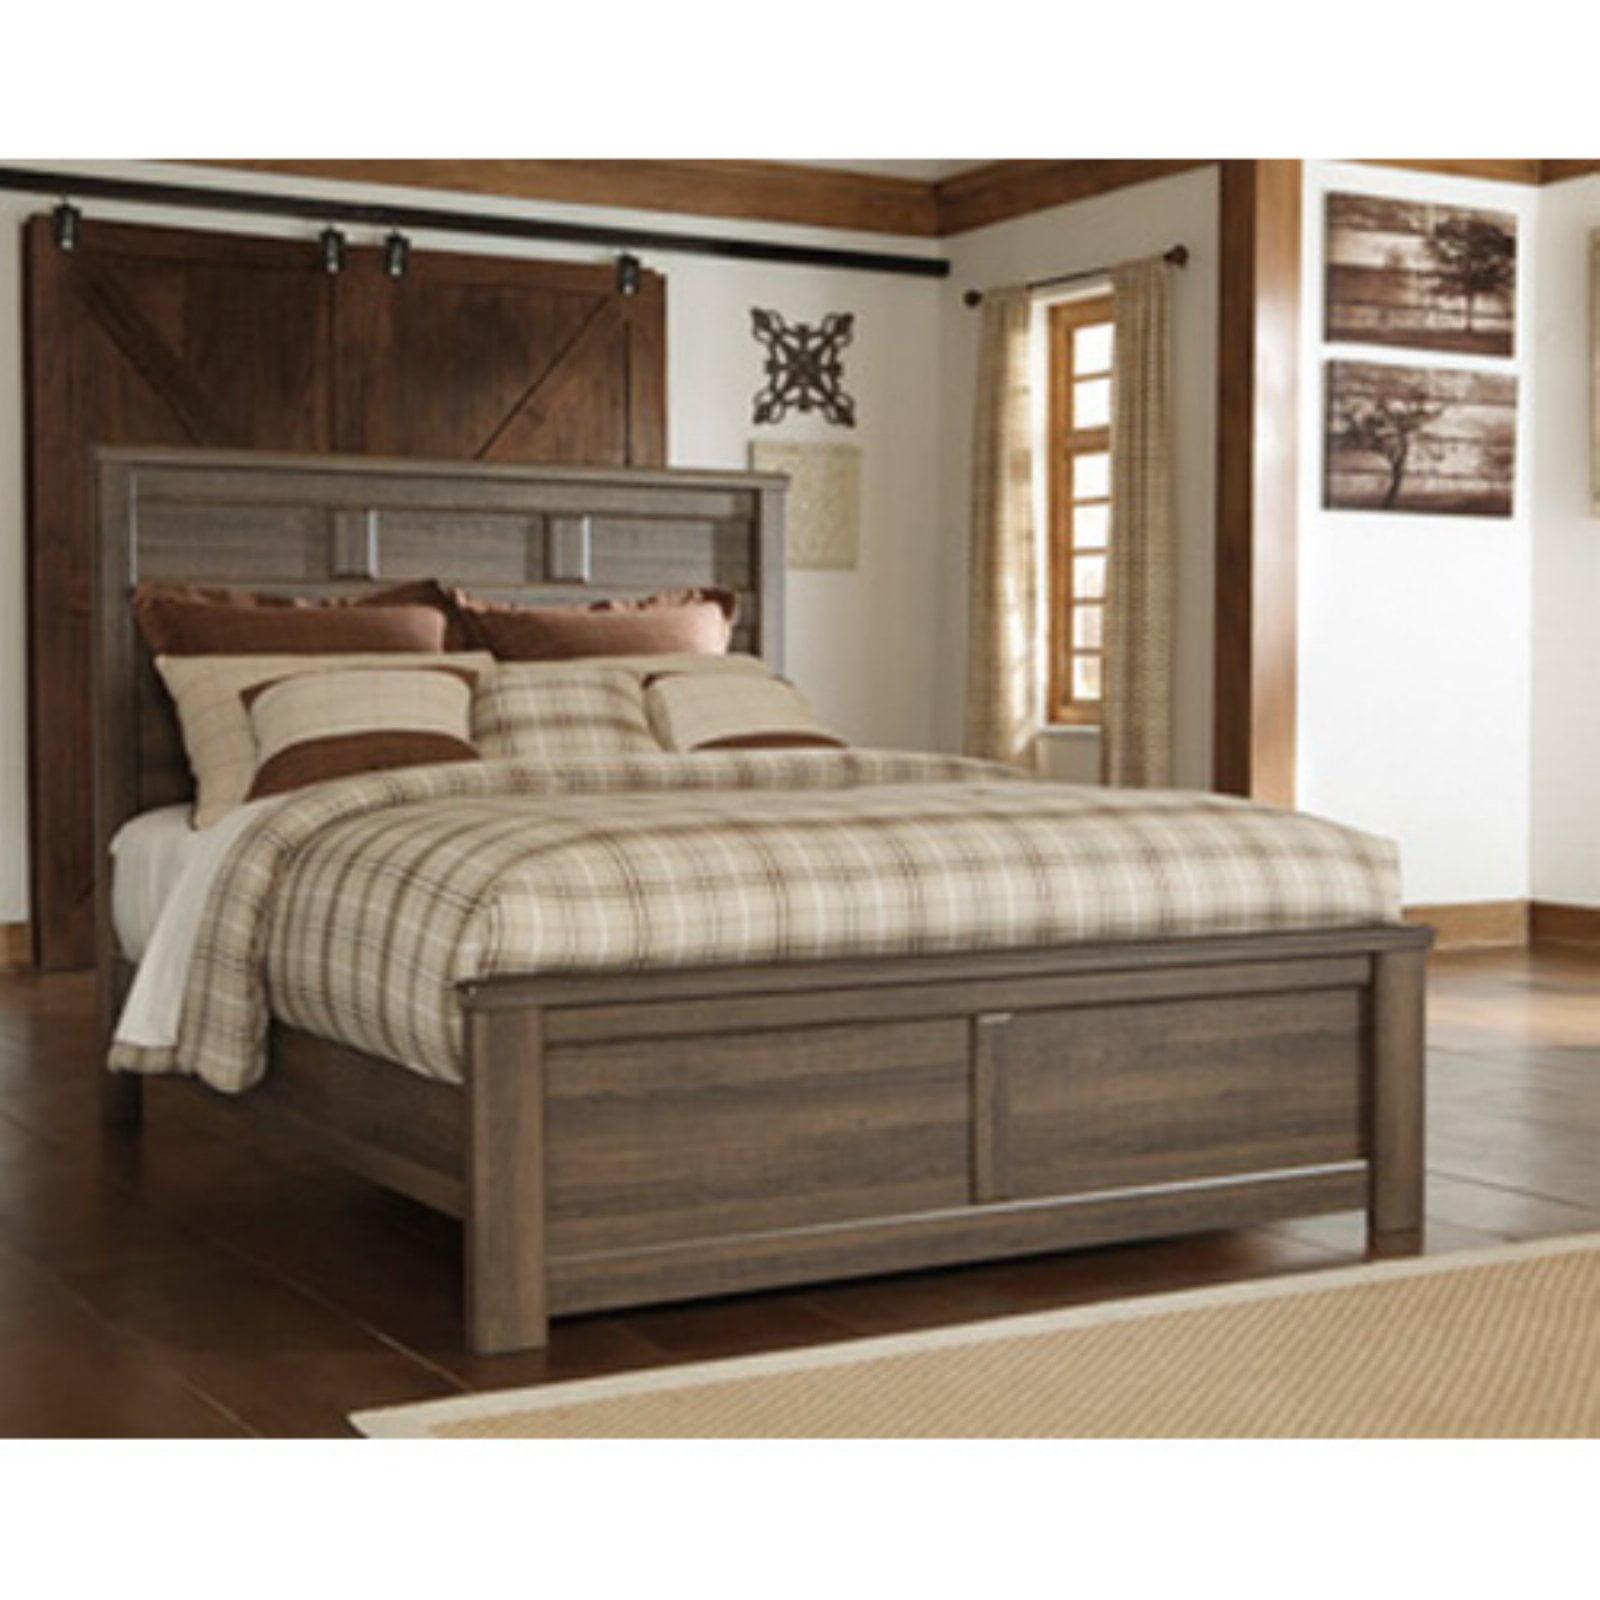 Signature Design by Ashley Juararo Panel Bed